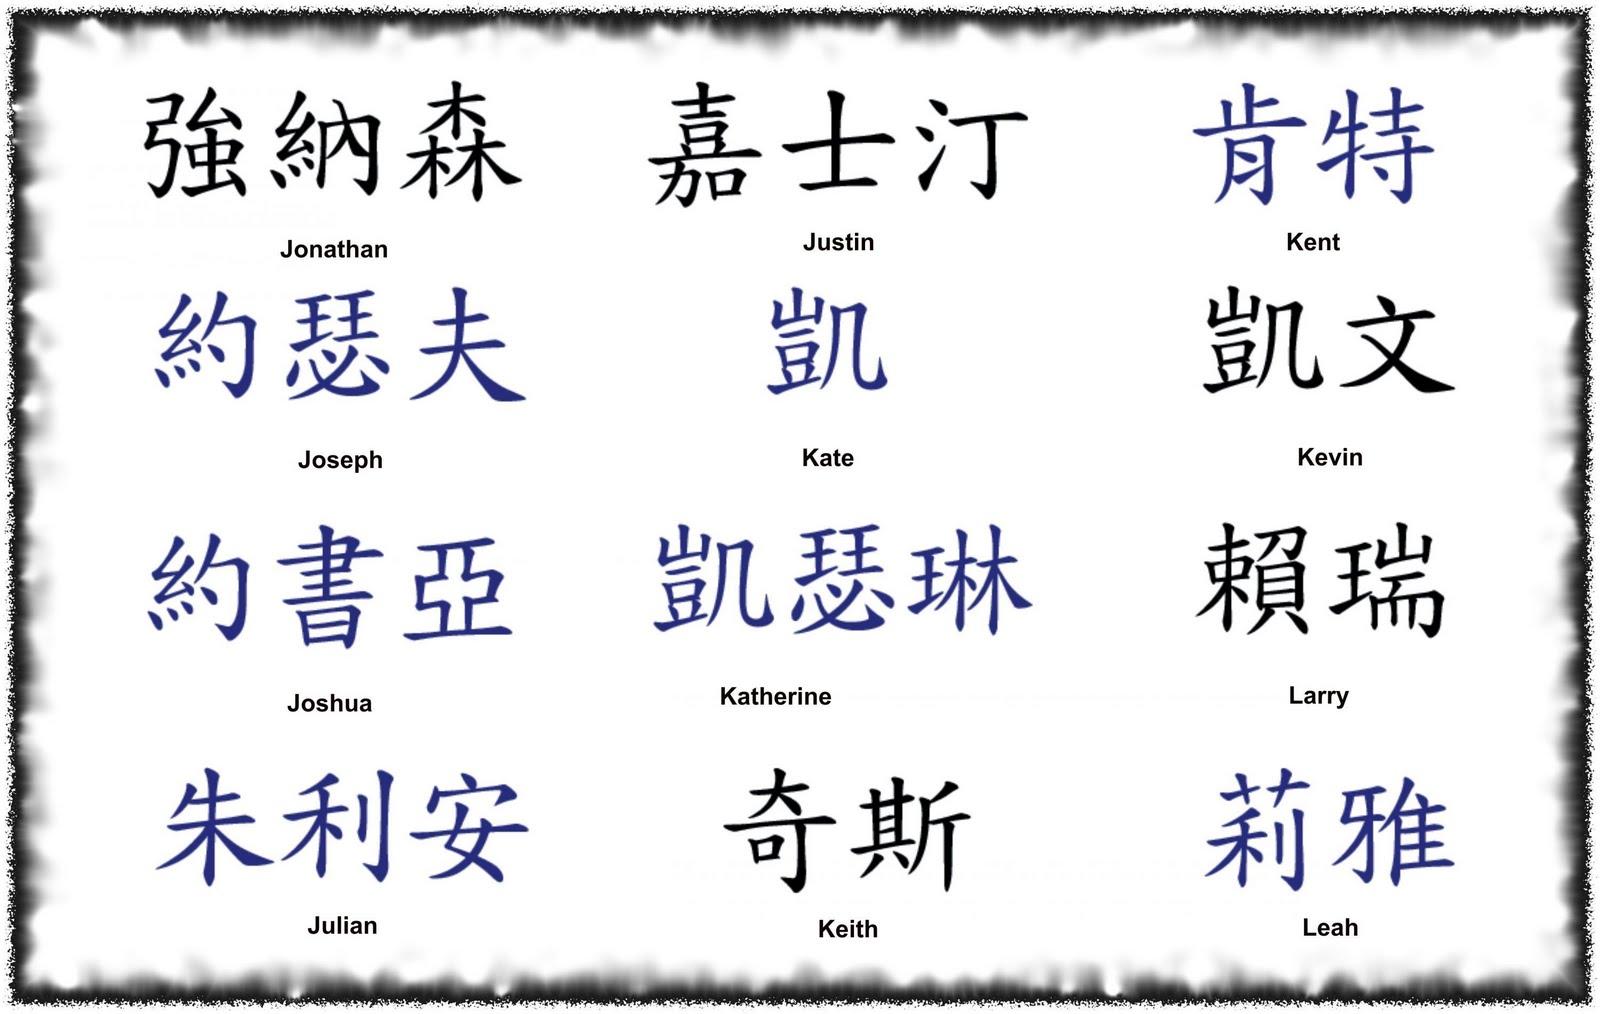 Free calligraphy fonts wedding, japanese kanji tattoo ideas